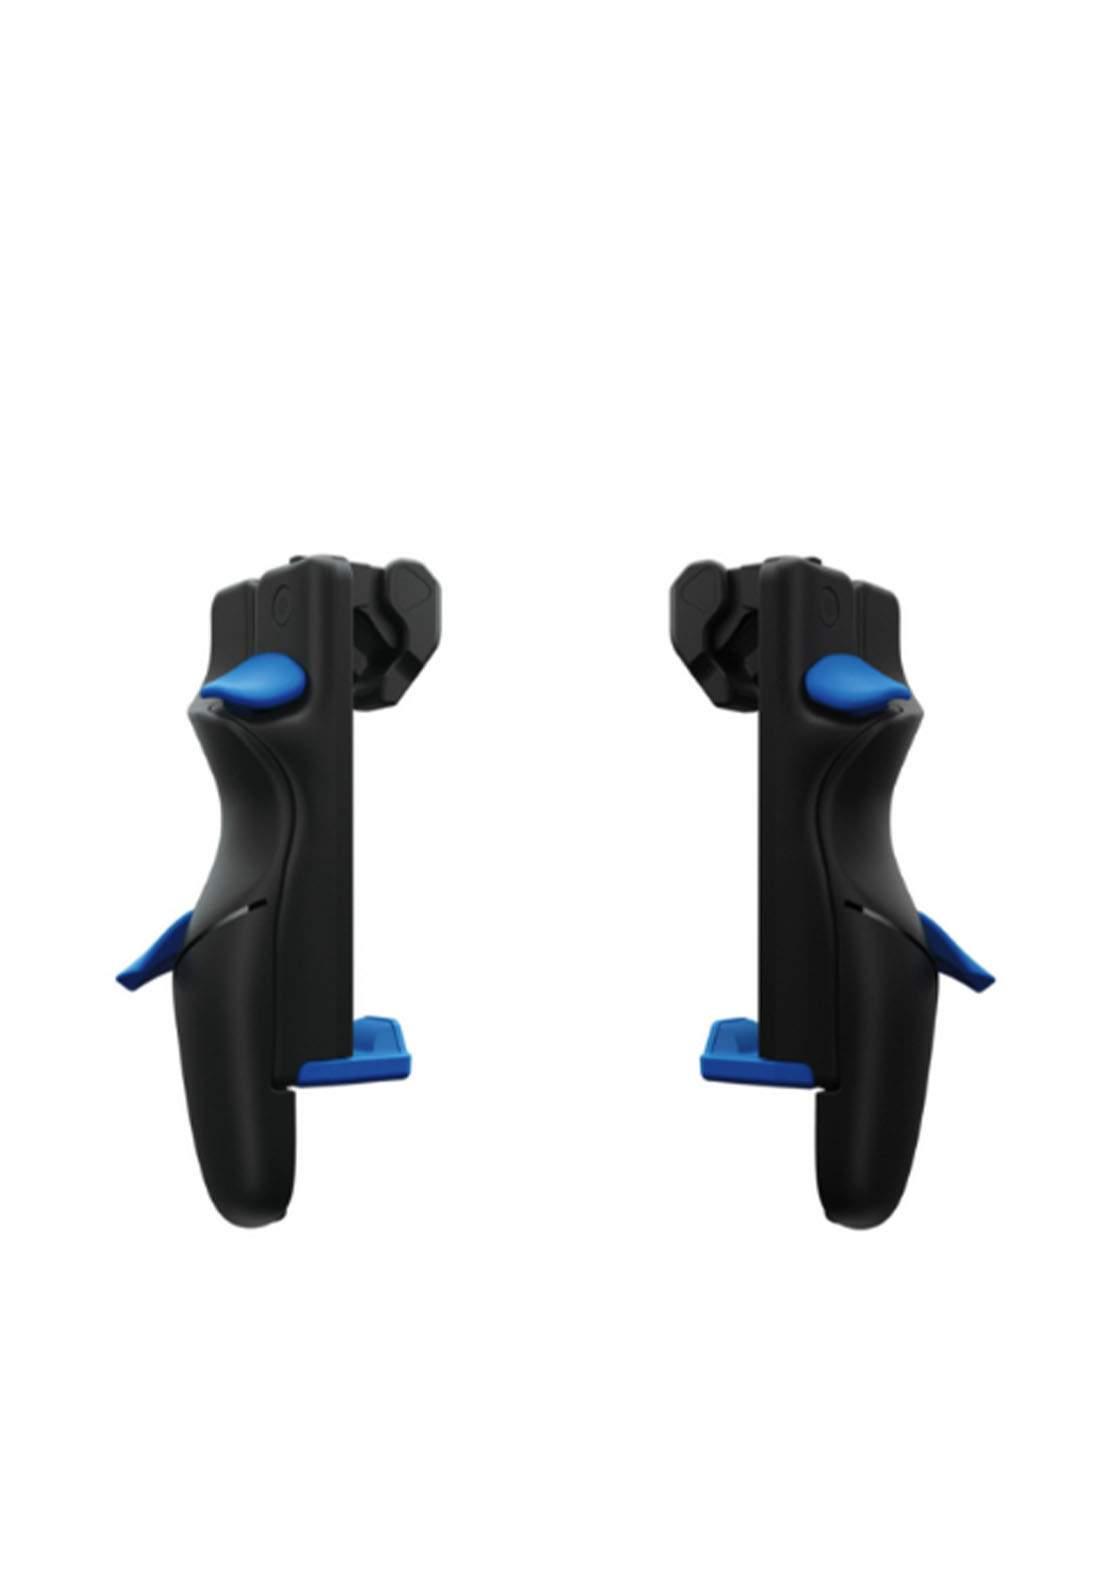 Flydigi Stinger 2 Mobile Gaming Controller - Black وحدة تحكم